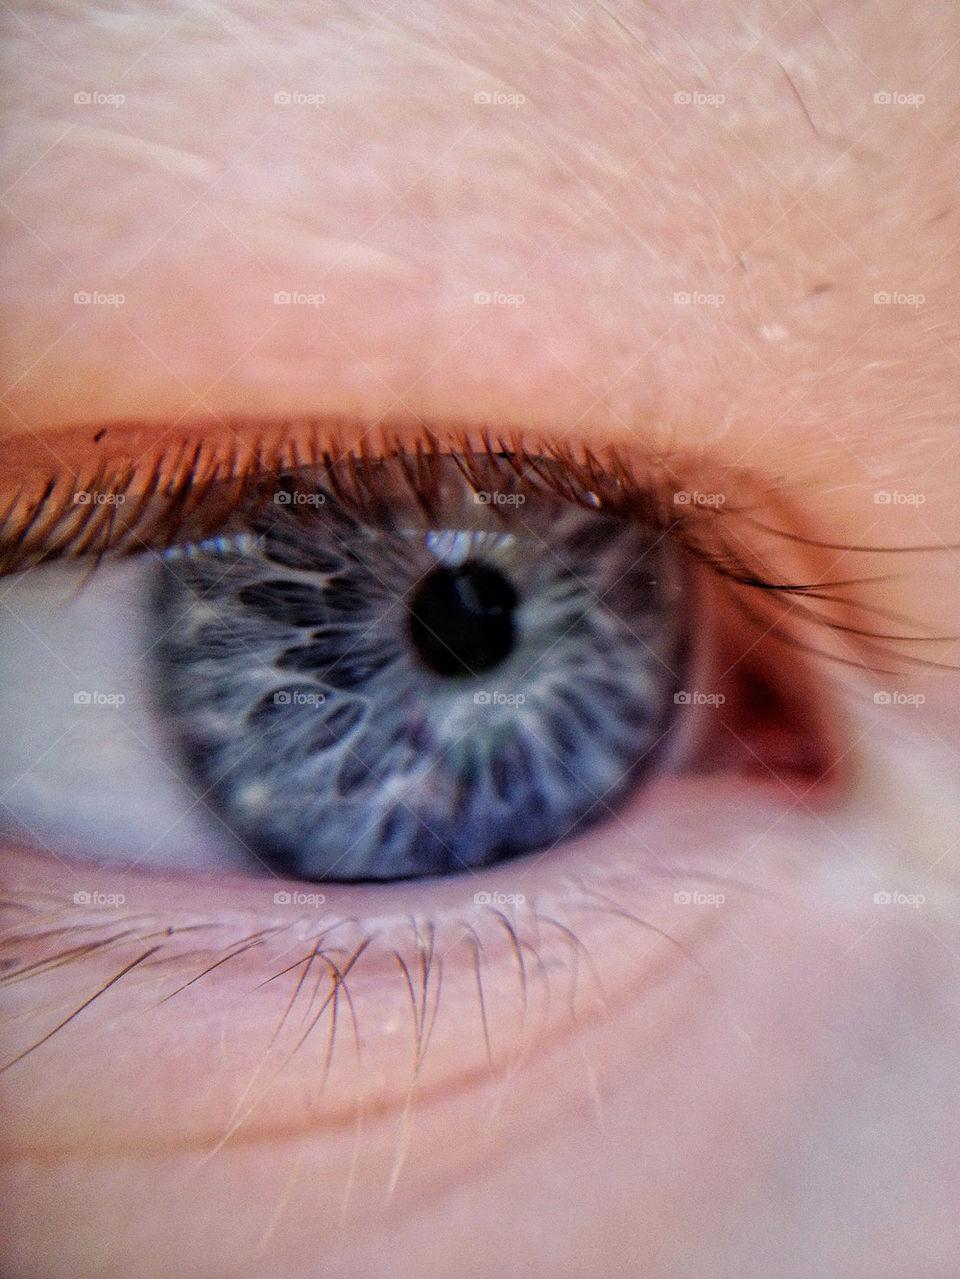 Close-up of blue eye